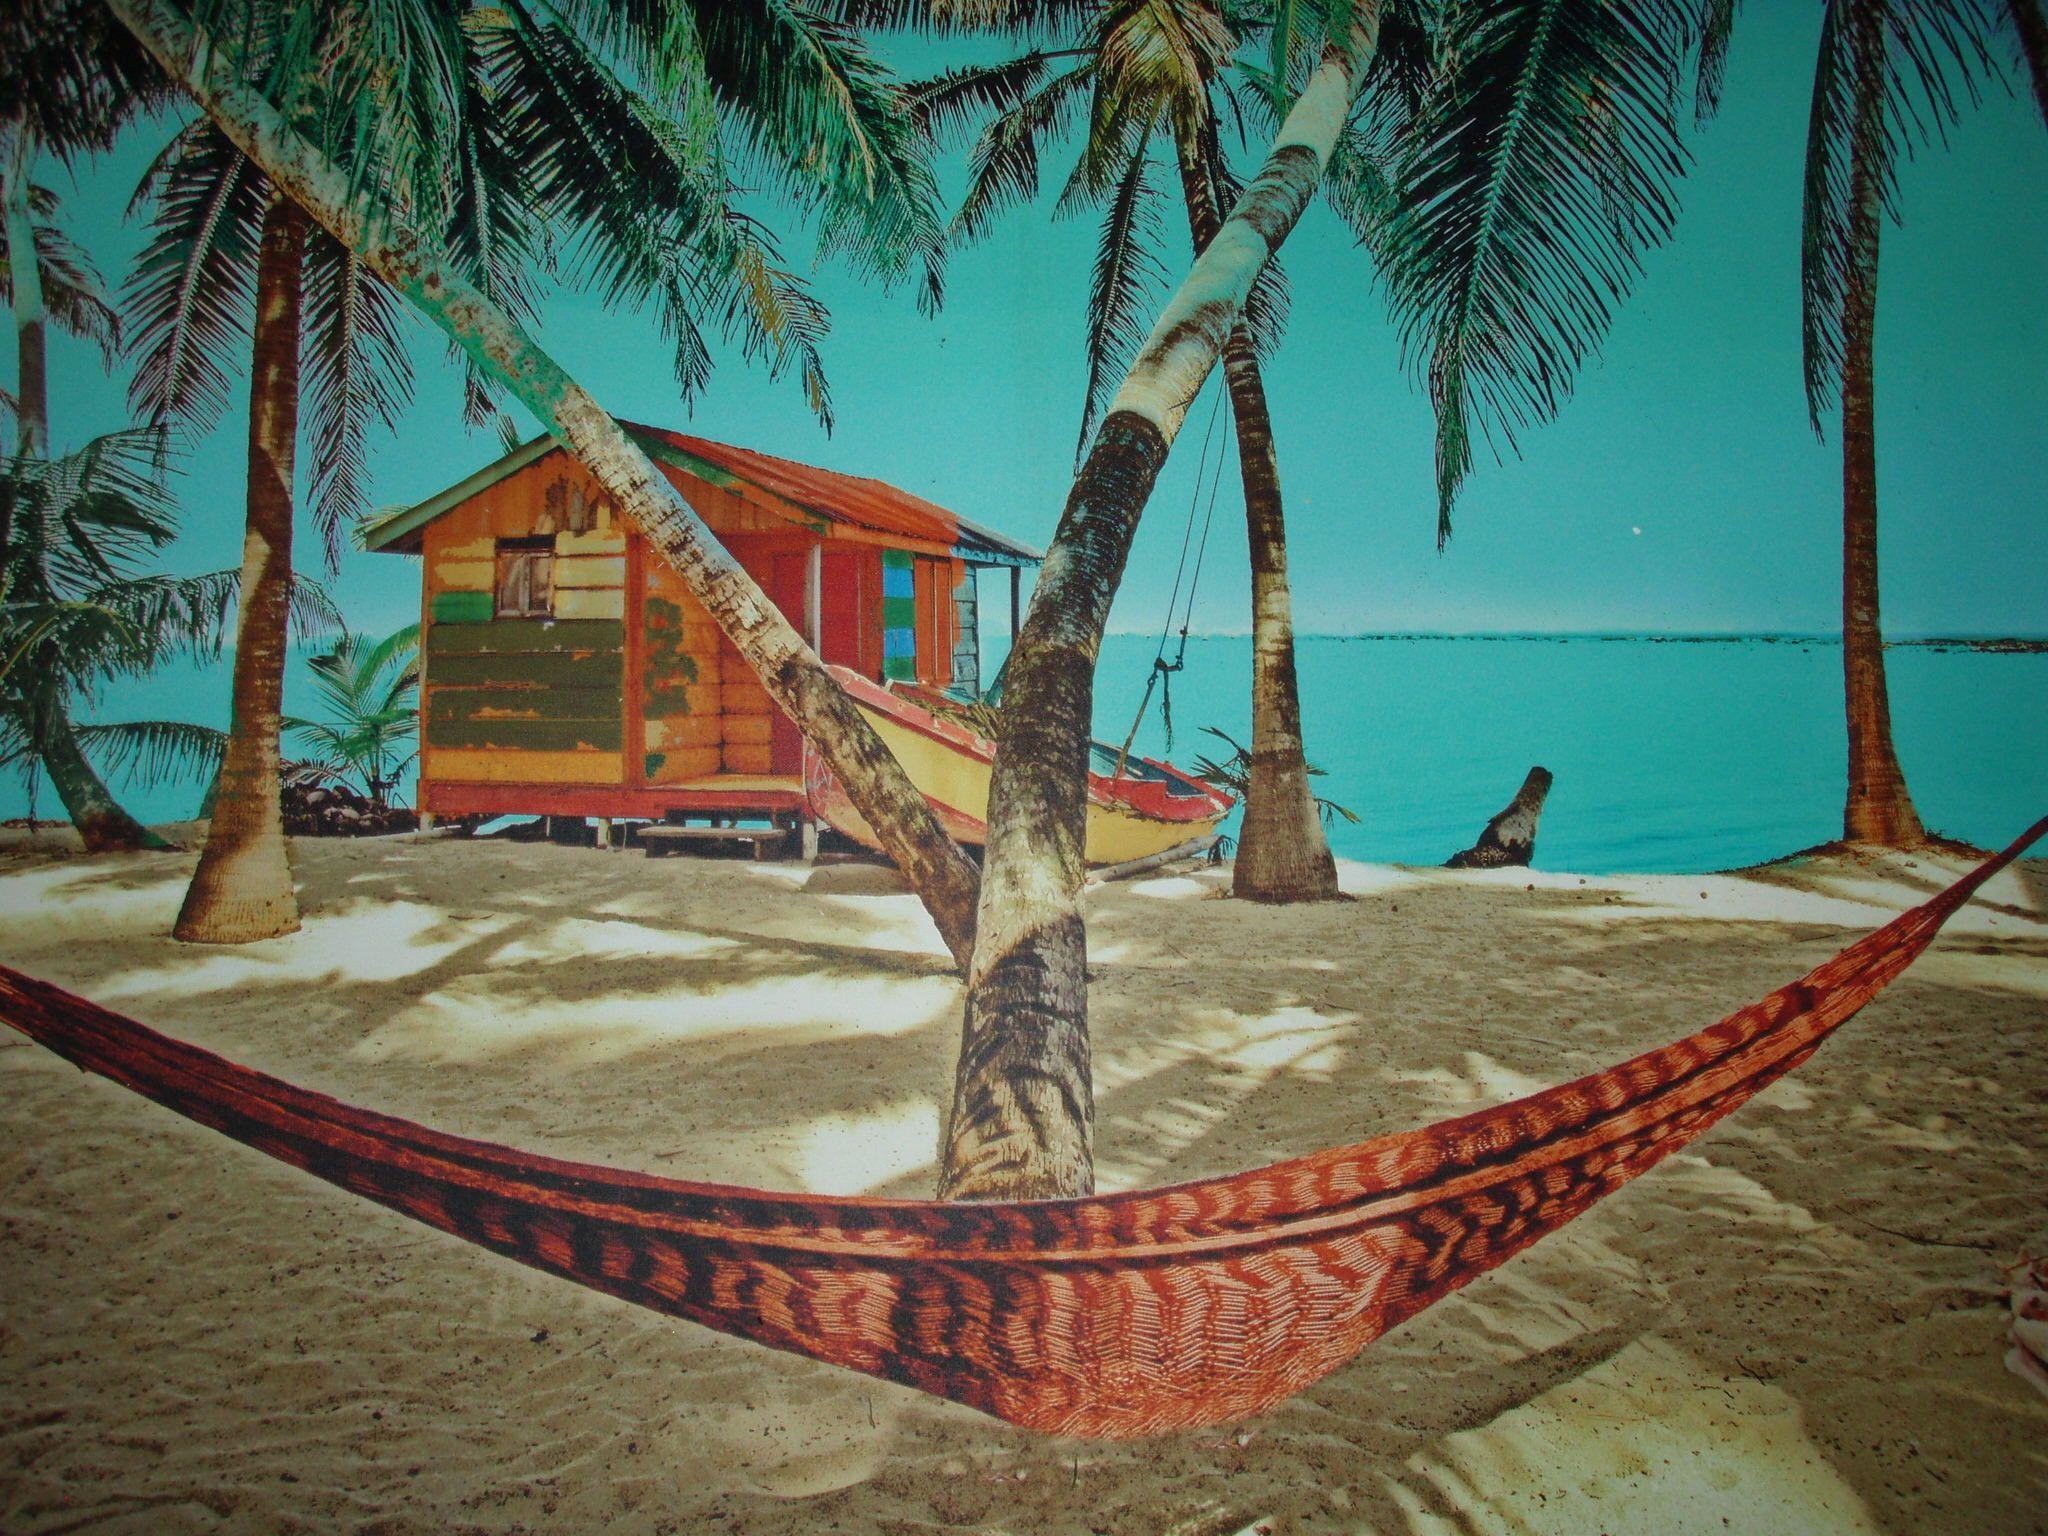 Best 25 Hammock Beach Ideas On Pinterest Beach Resorts Best Vacation Spots And Resorts In